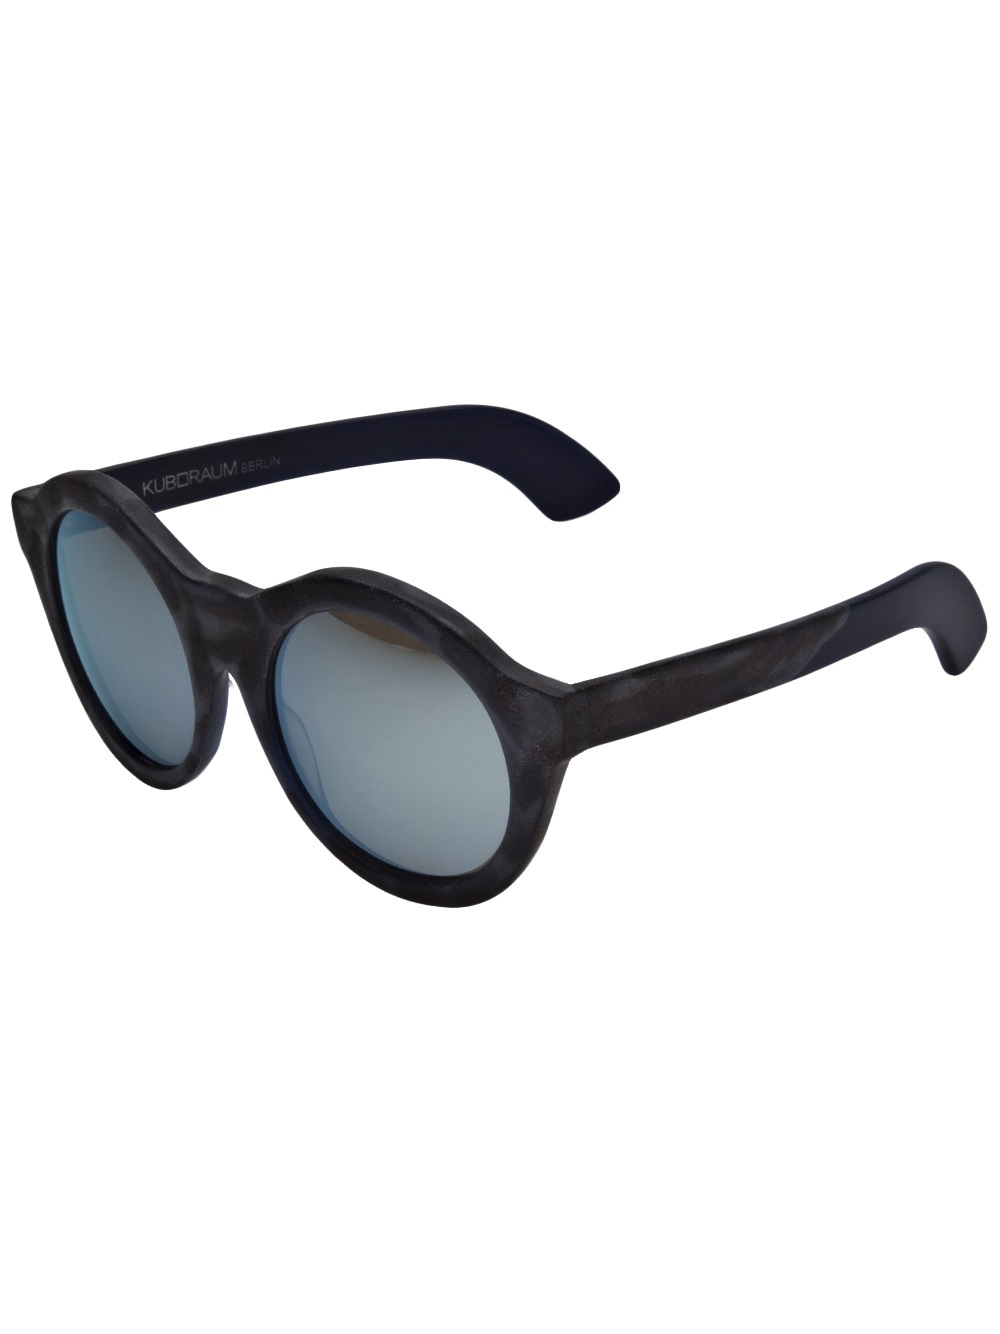 Large Round Frame Glasses : Kuboraum Large Round Frame Sunglasses in Black for Men Lyst